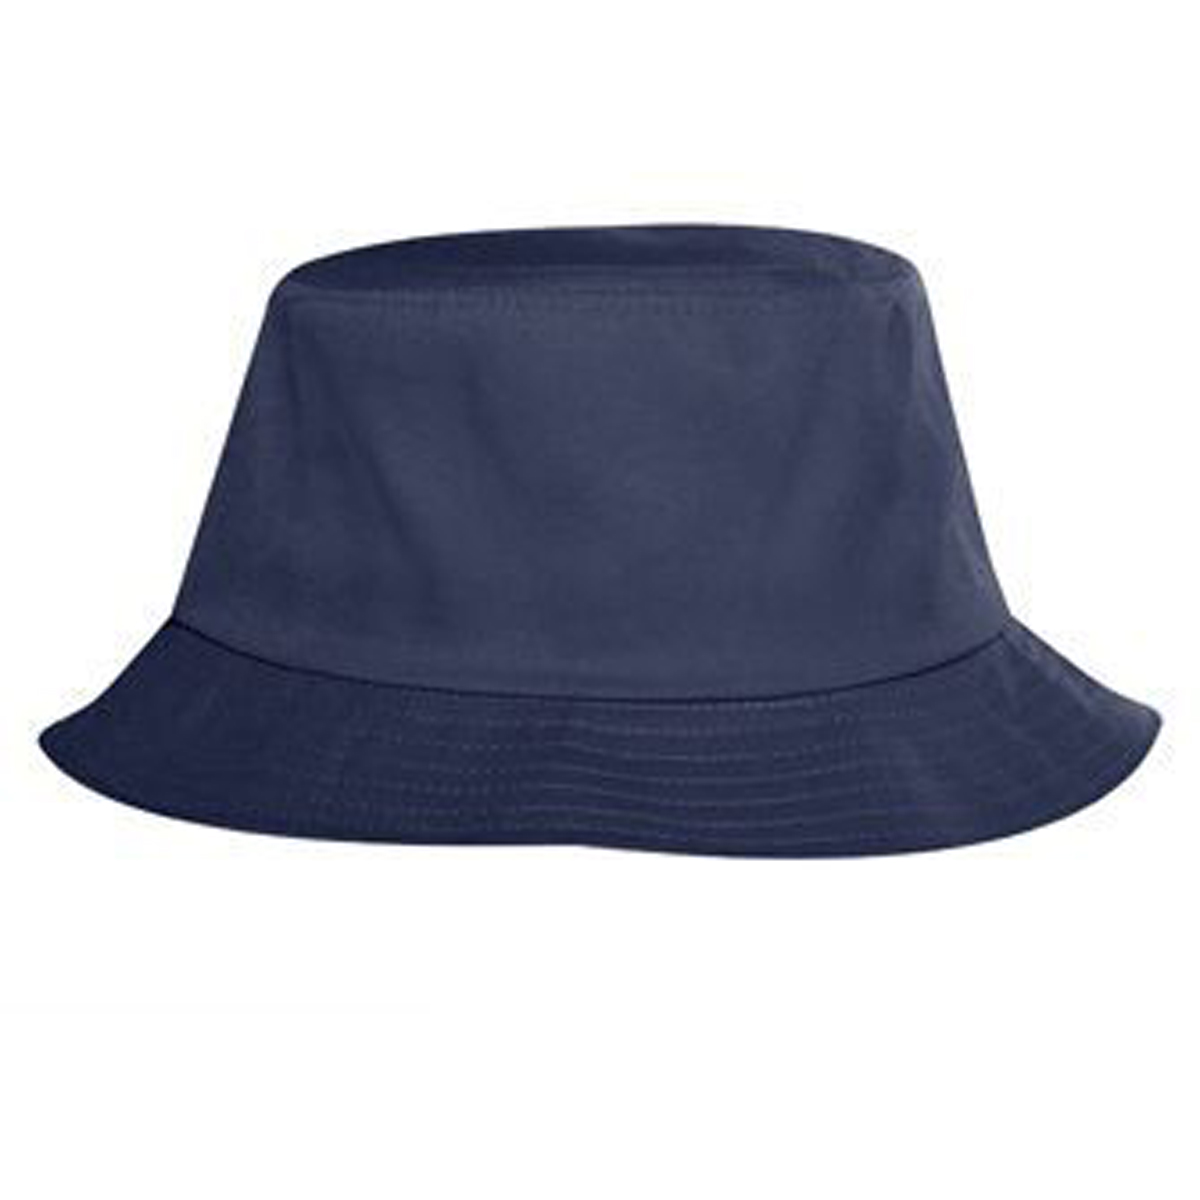 21845f004ae Otto Cap Promo Cotton Twill Bucket Hats (M) (L) - Hat   Cap for Summer